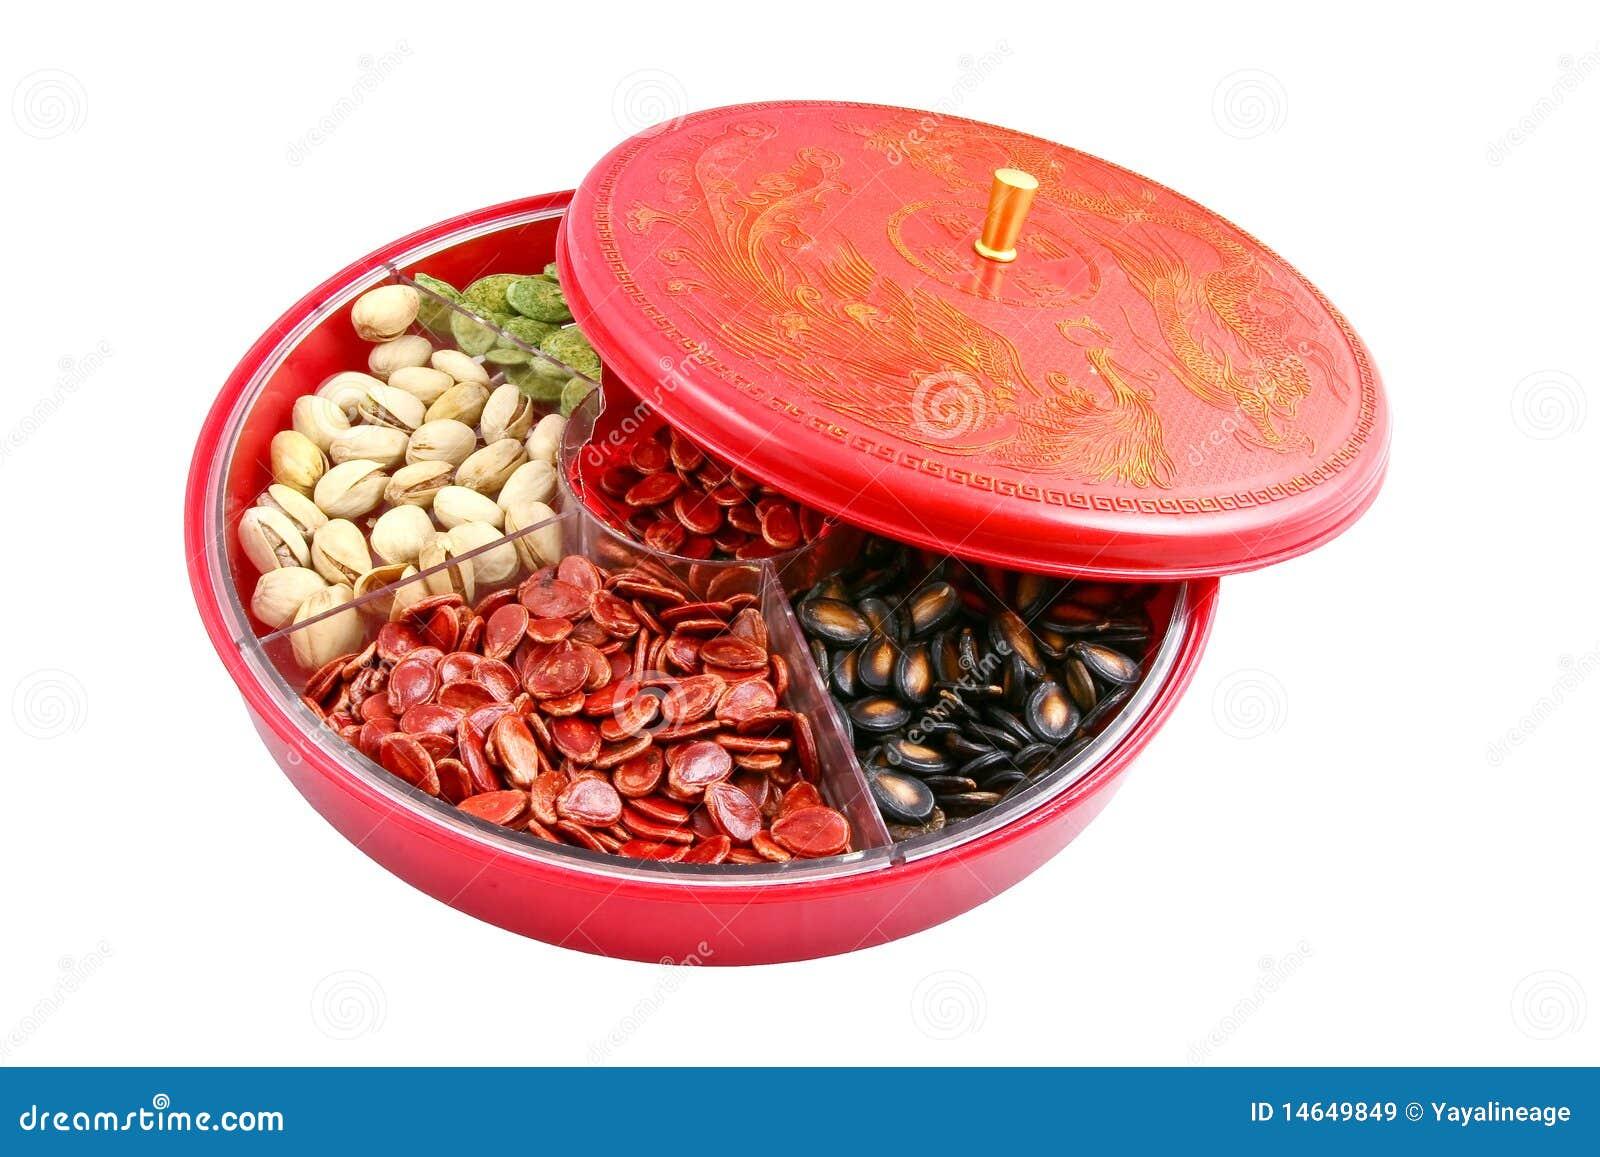 Chinese New Year - Chinese Candy Box